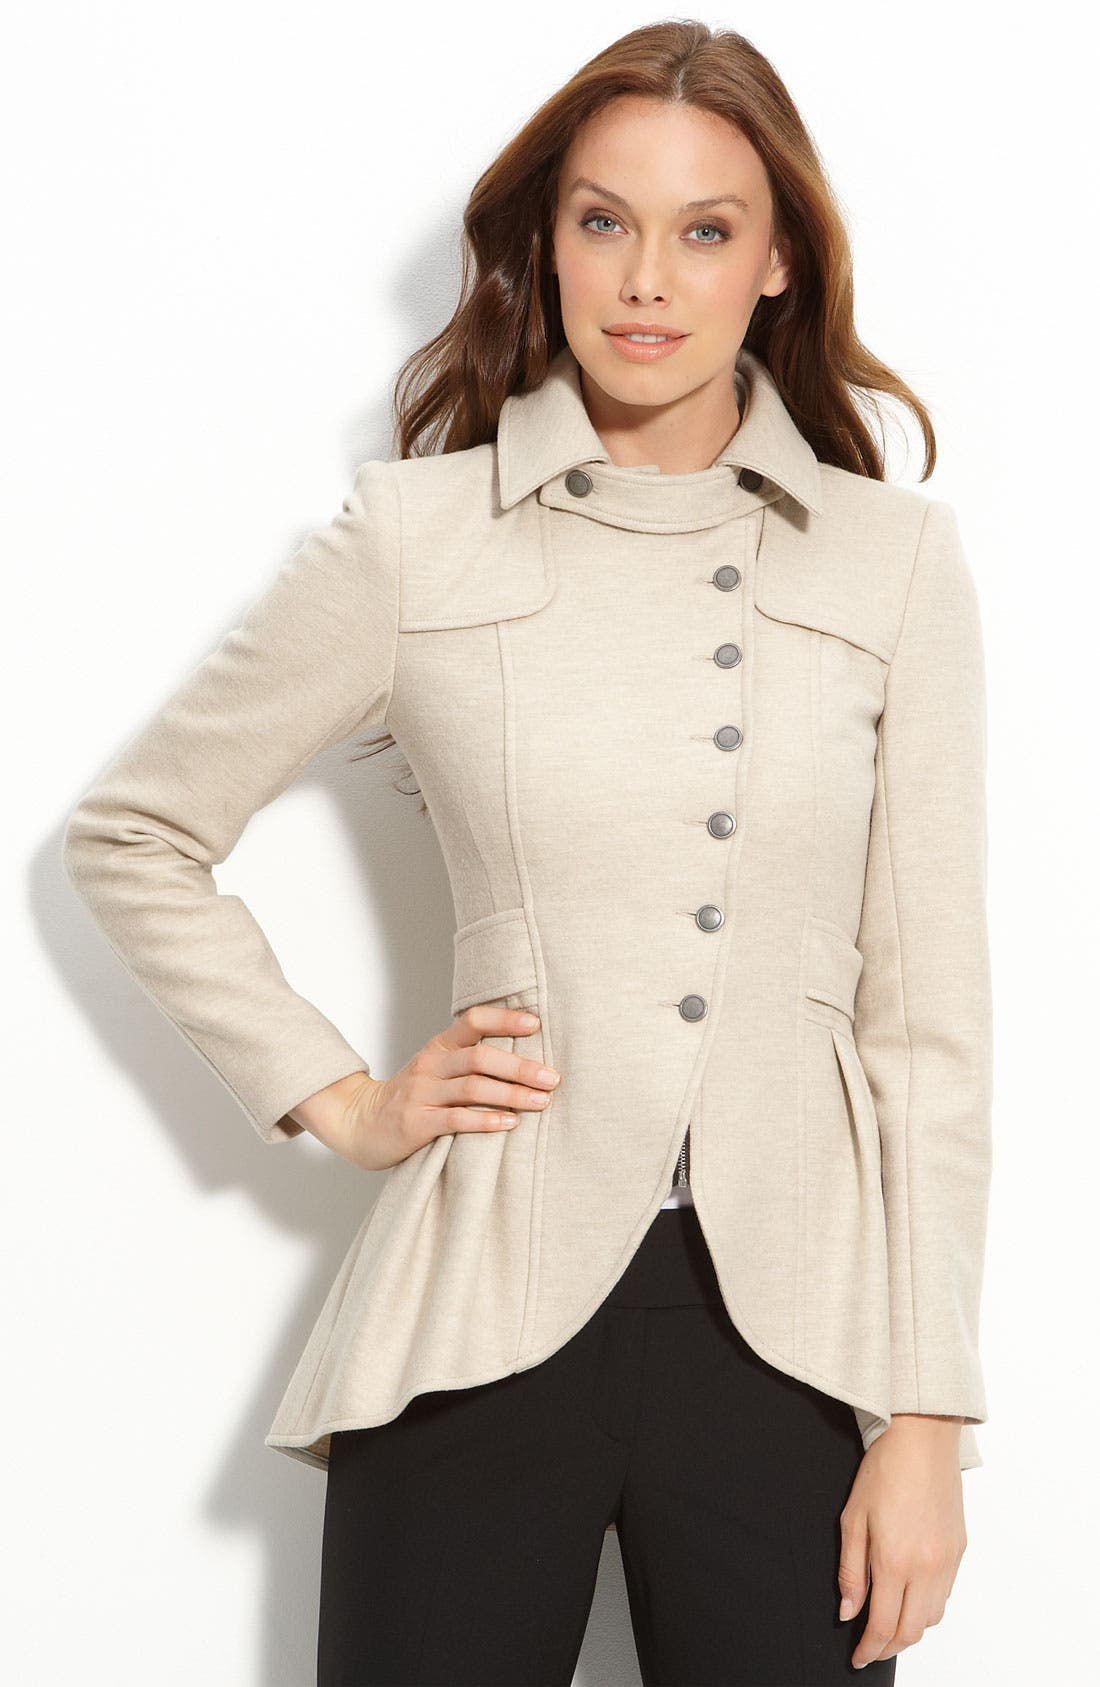 Alternate Image 1 Selected - Nanette Lepore 'Angelic' Jacket